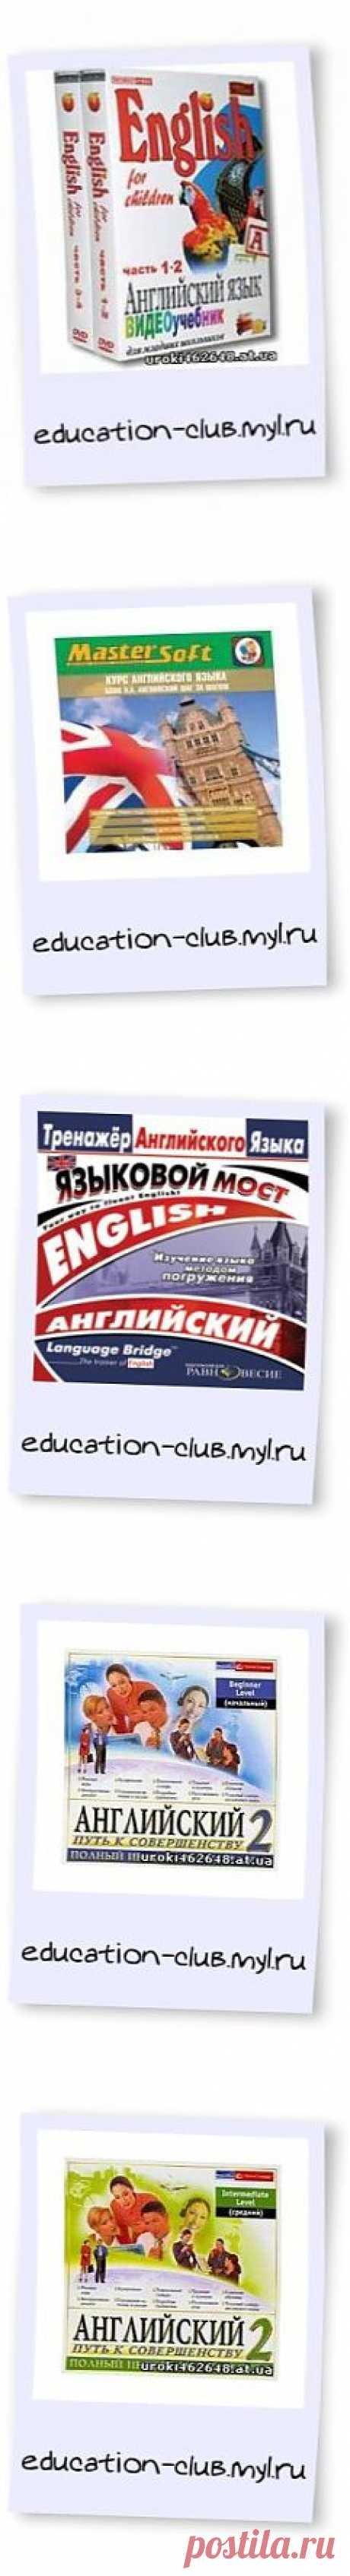 учим английский язык - Видеоуроки бесплатно - Видеоуроки